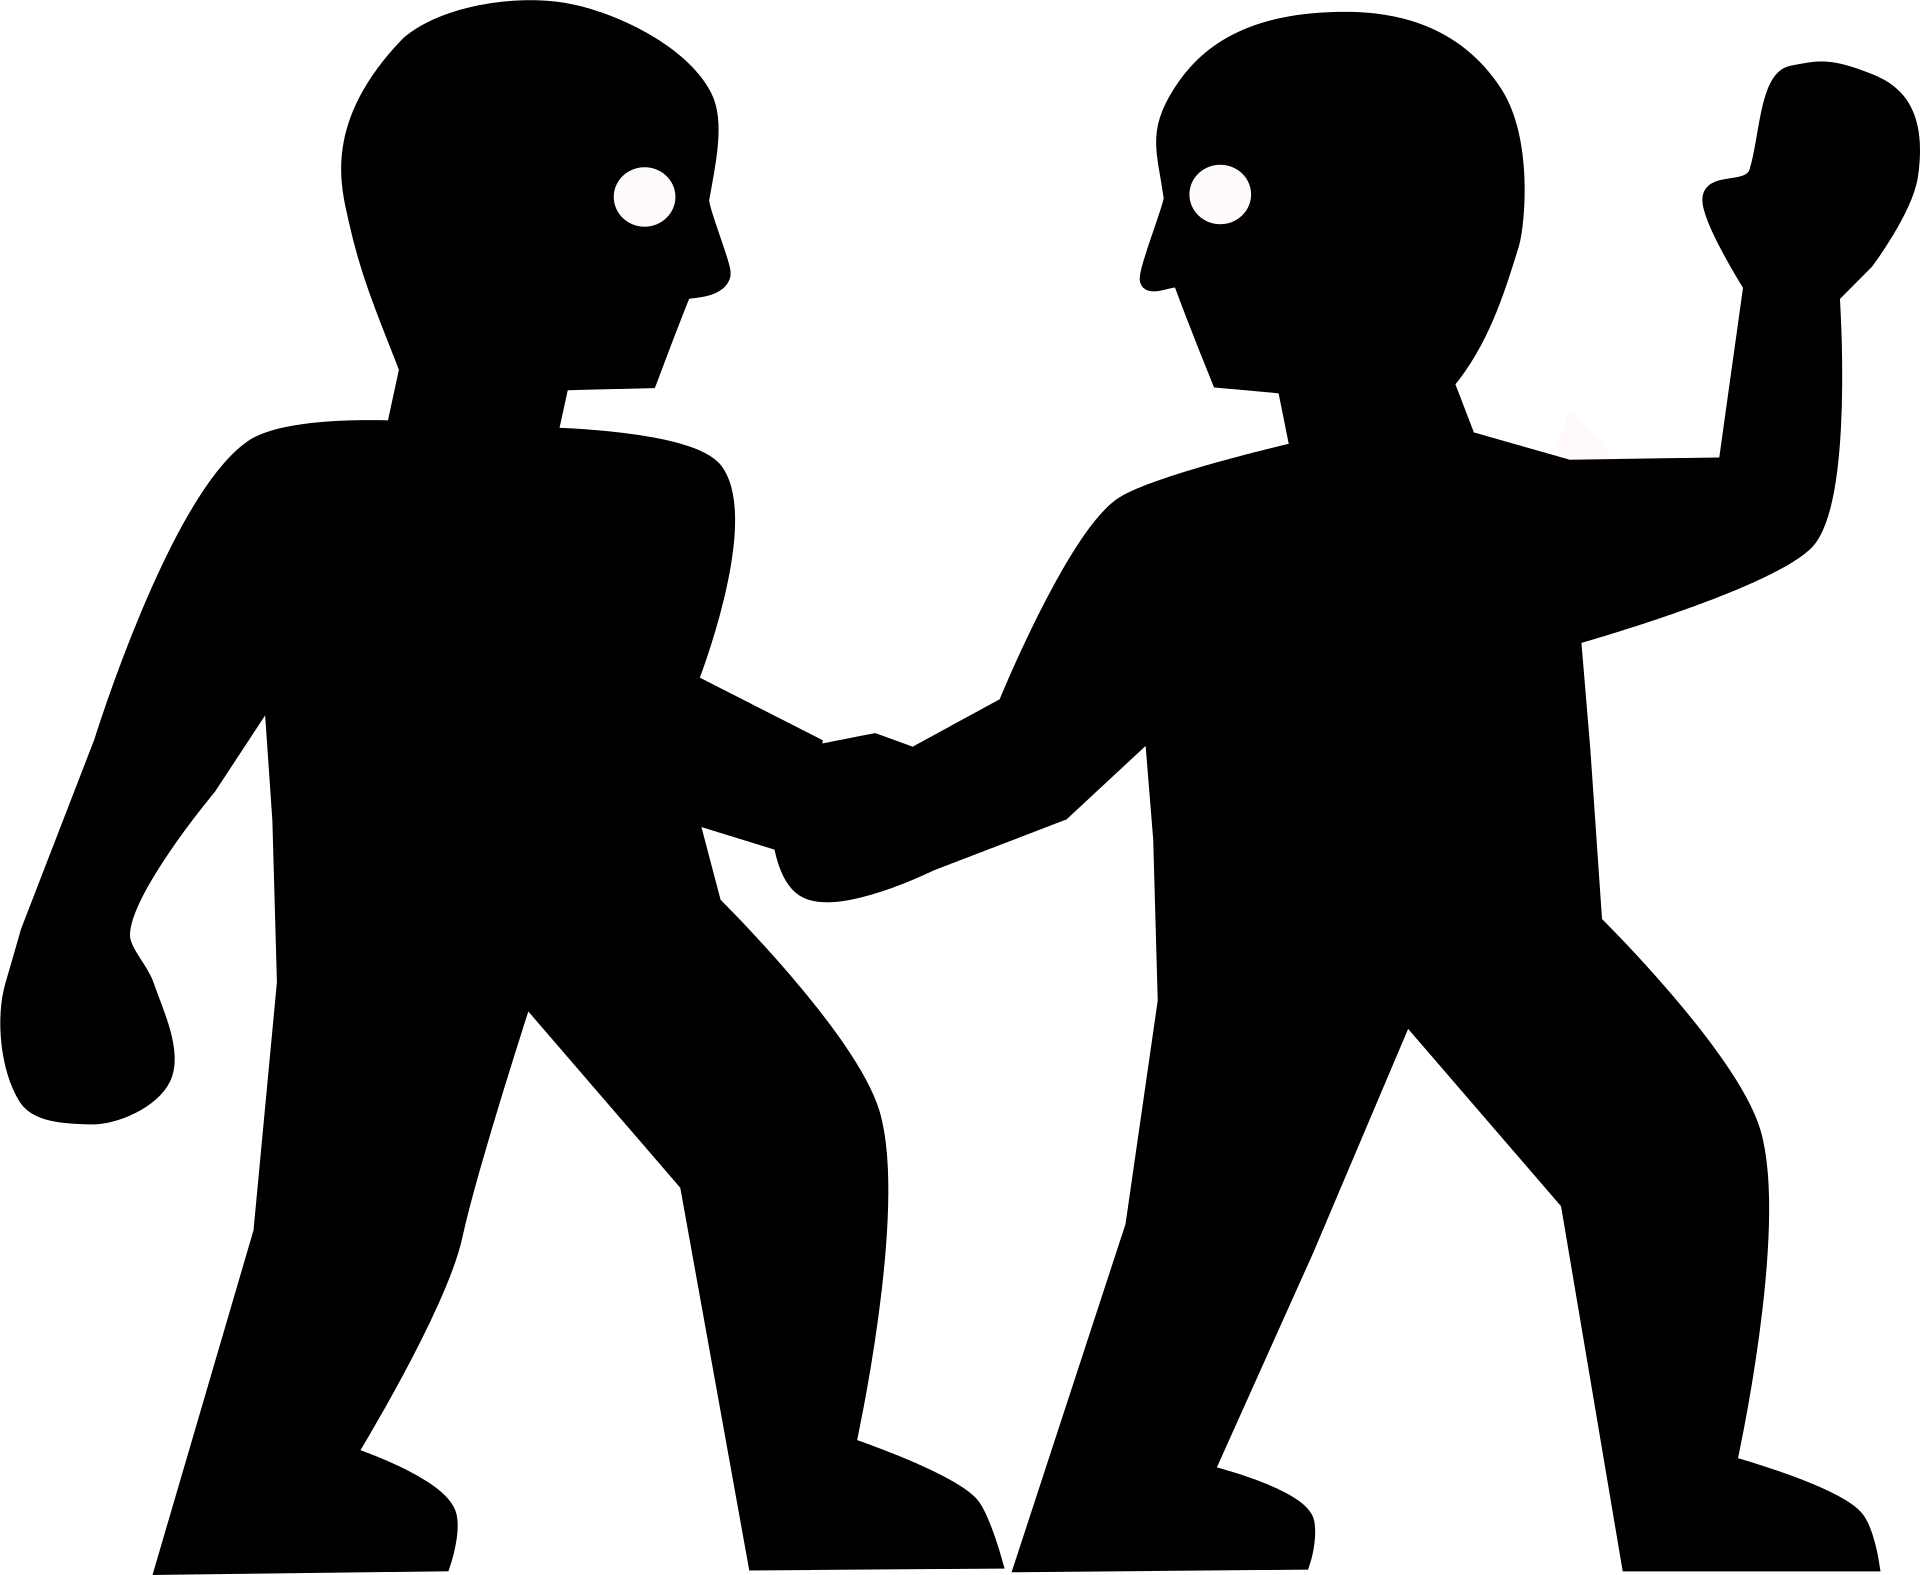 Gemini PNG Transparent Image SVG Clip arts